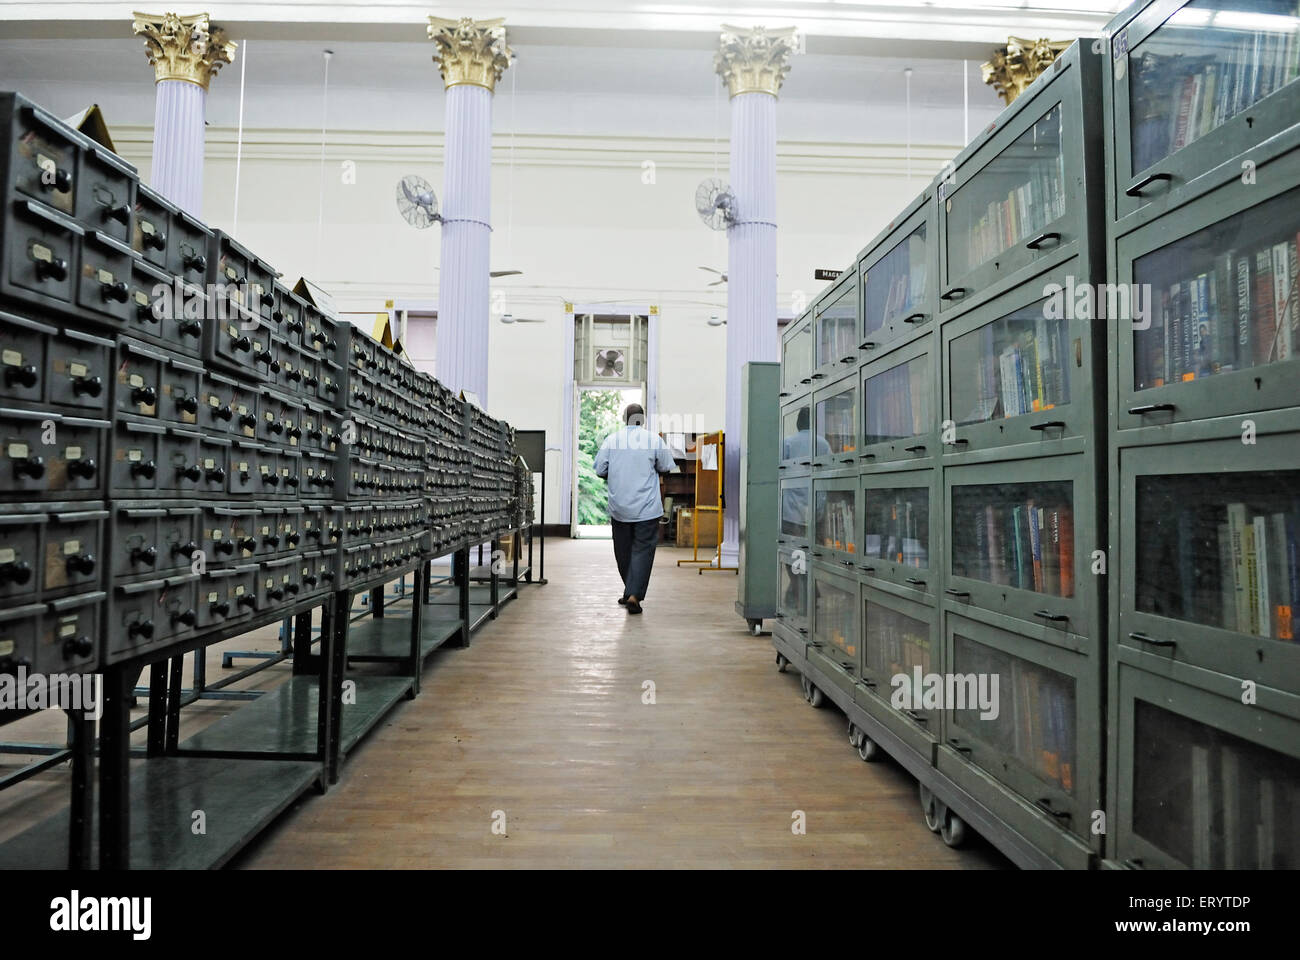 lockers and book shelves in town hall asiatic library Bombay Mumbai ; Maharashtra ; India - Stock Image